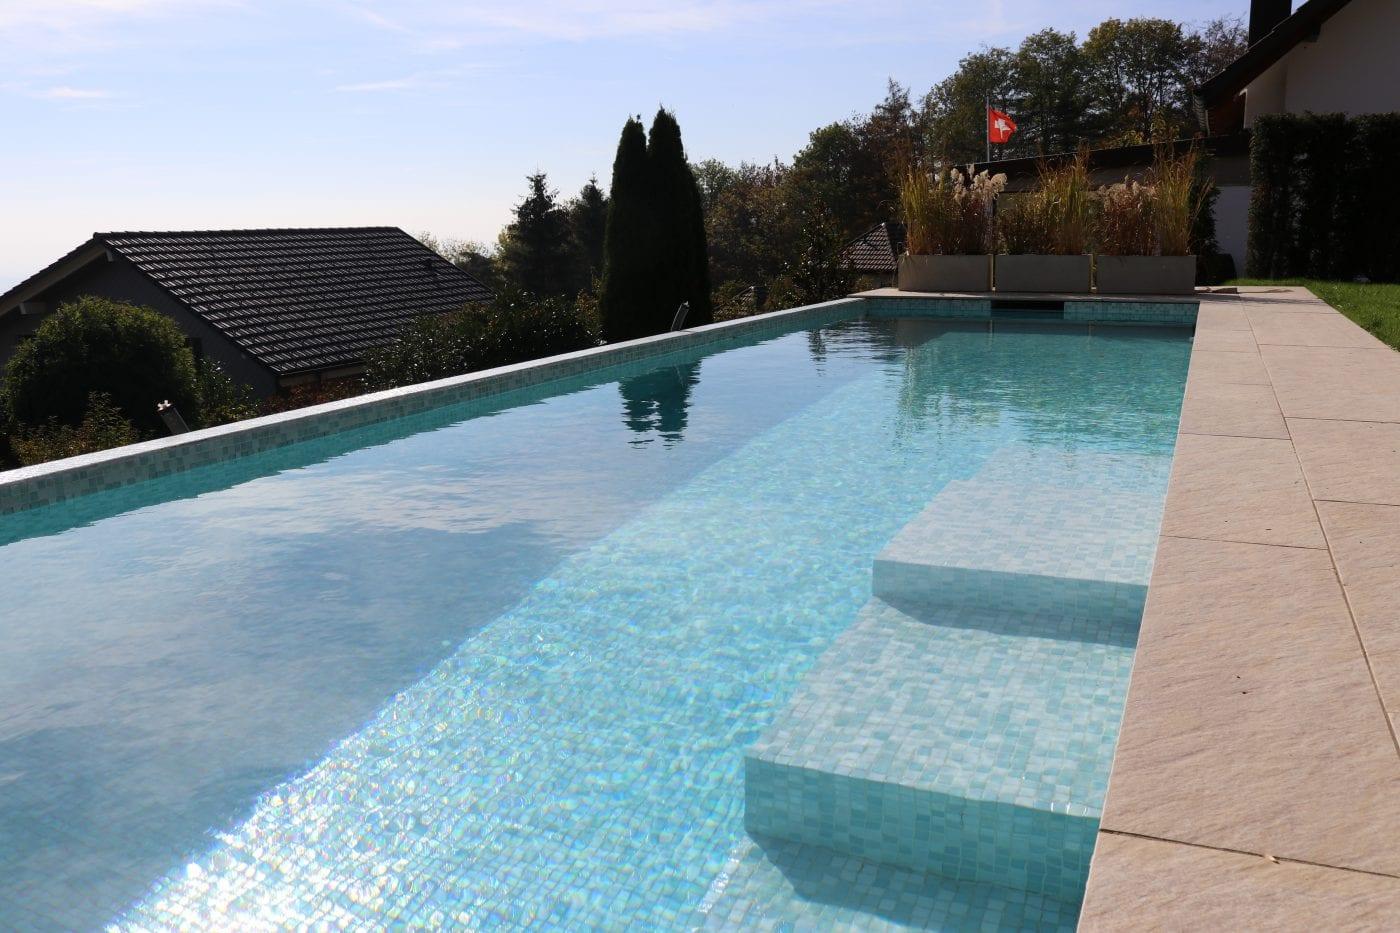 Luxe Tilestone Swimming Pool